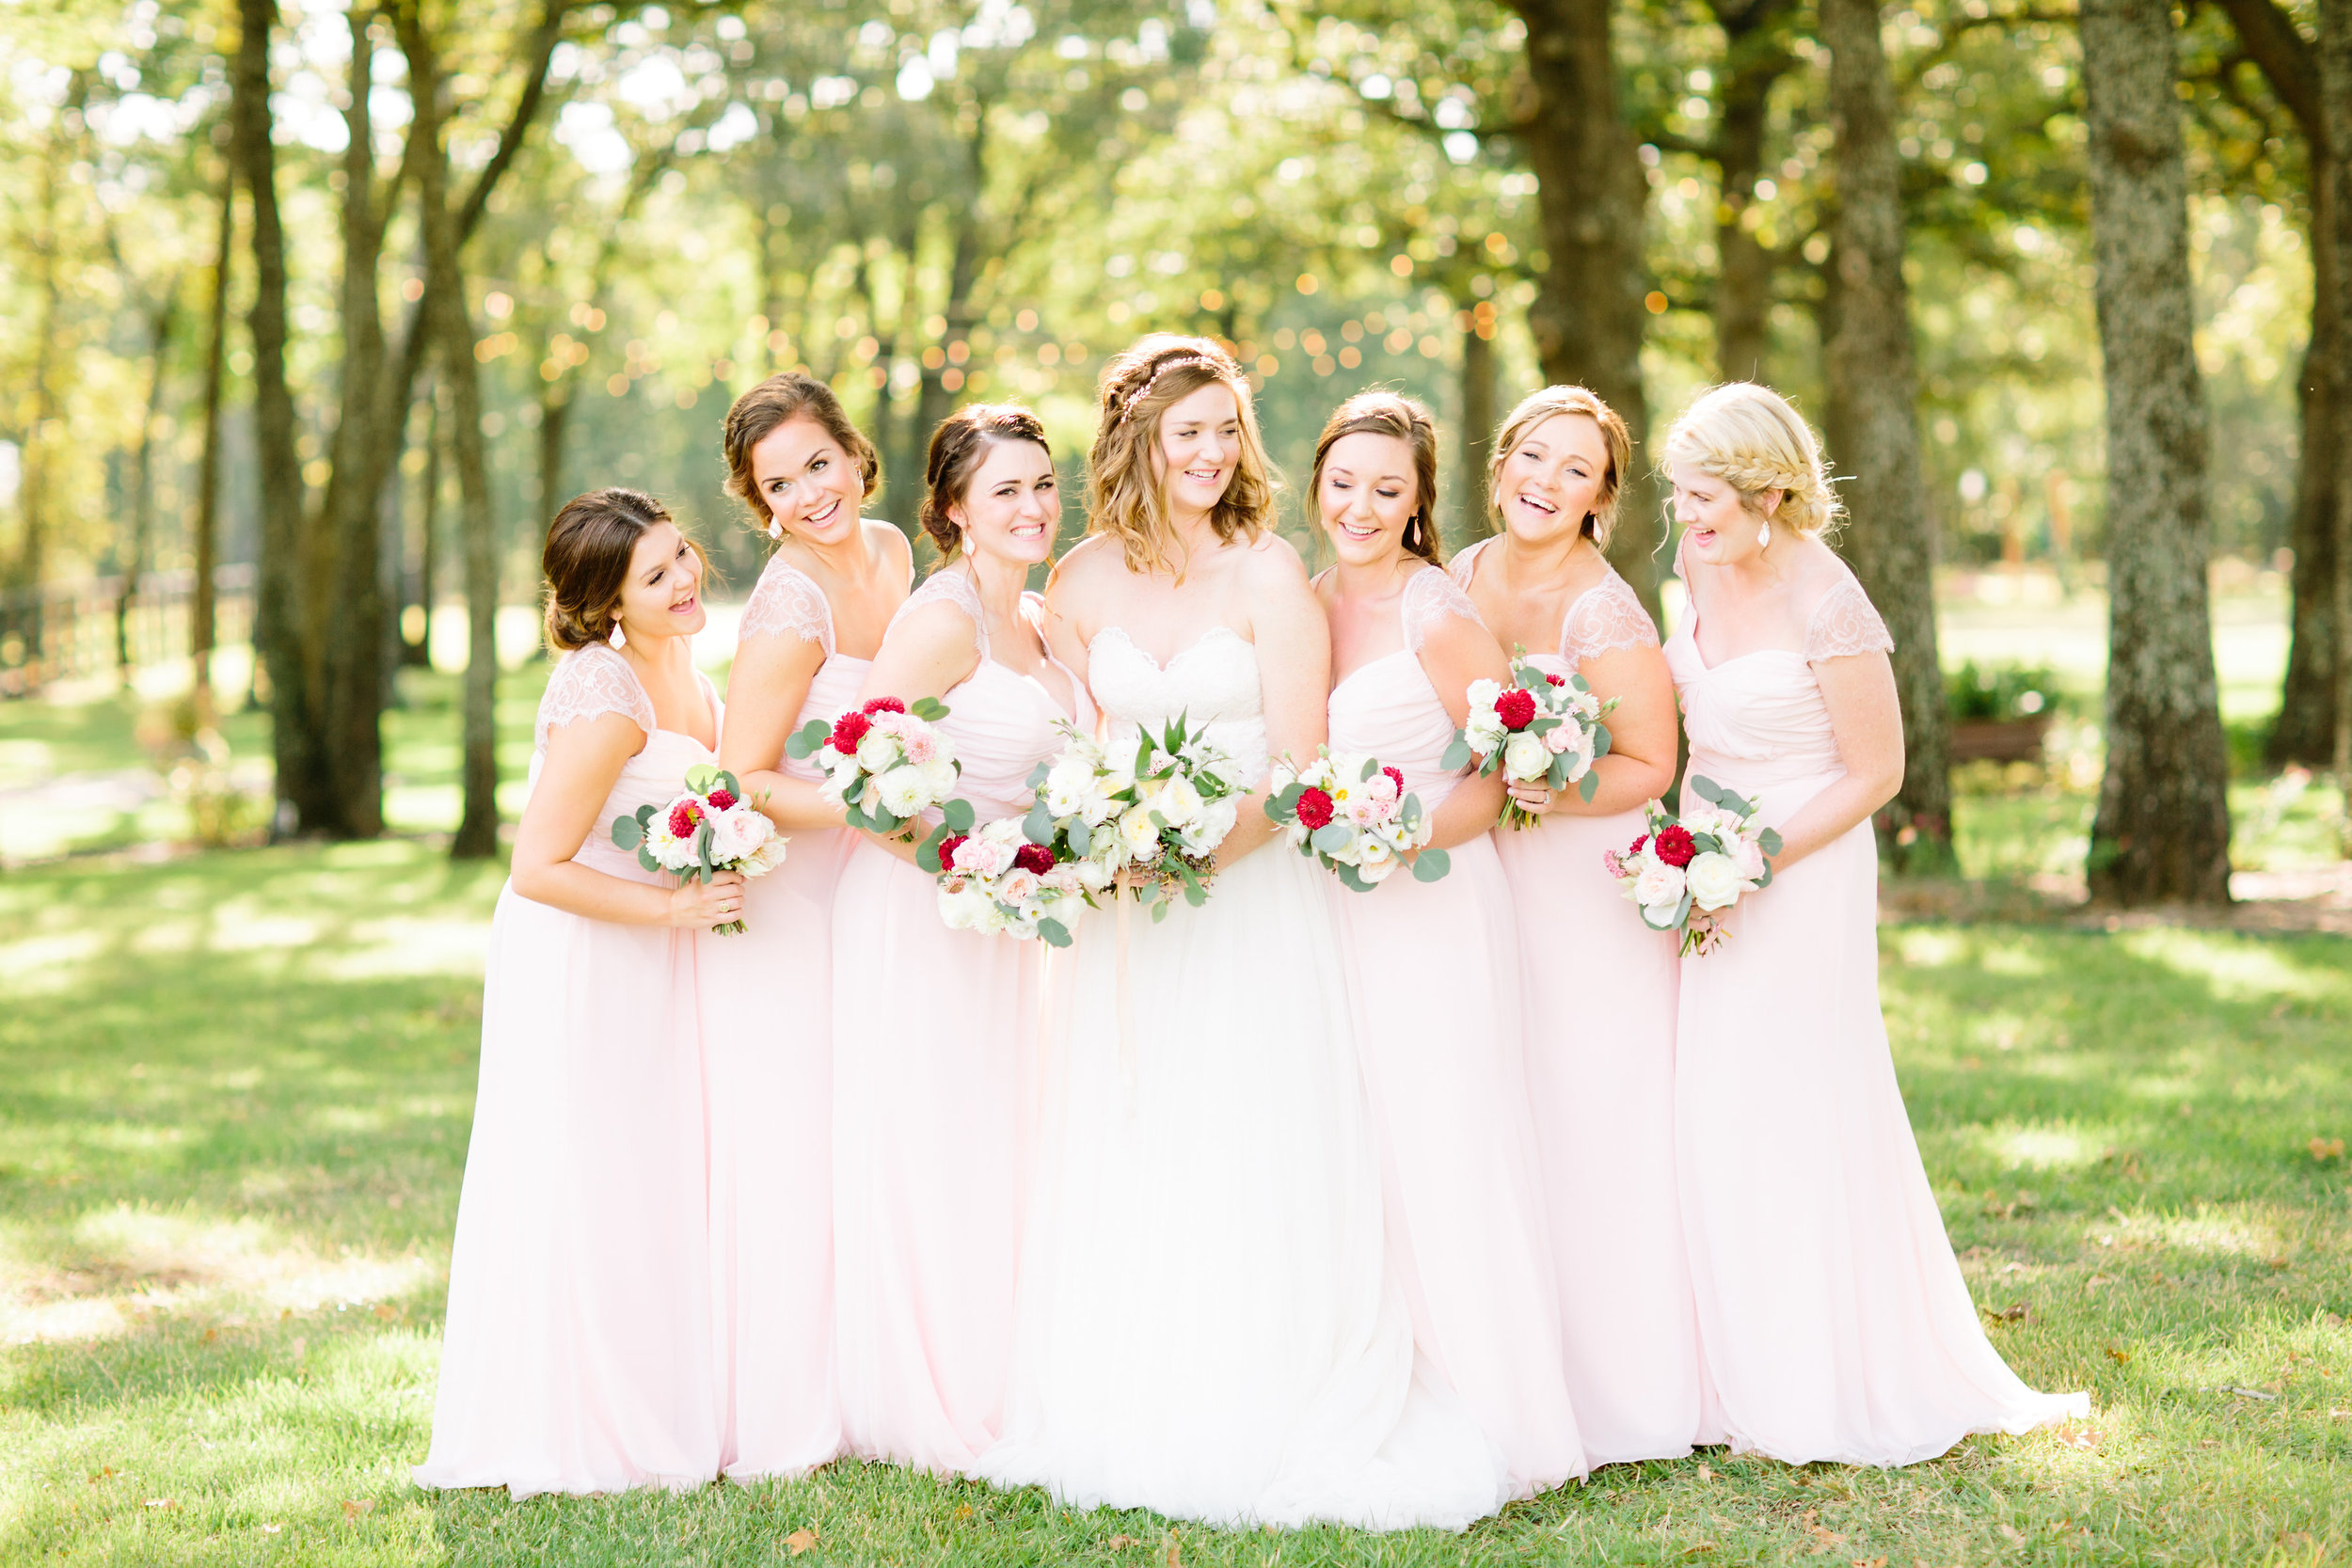 Blush Bridesmaid Dresses - Dallas Wedding Florist